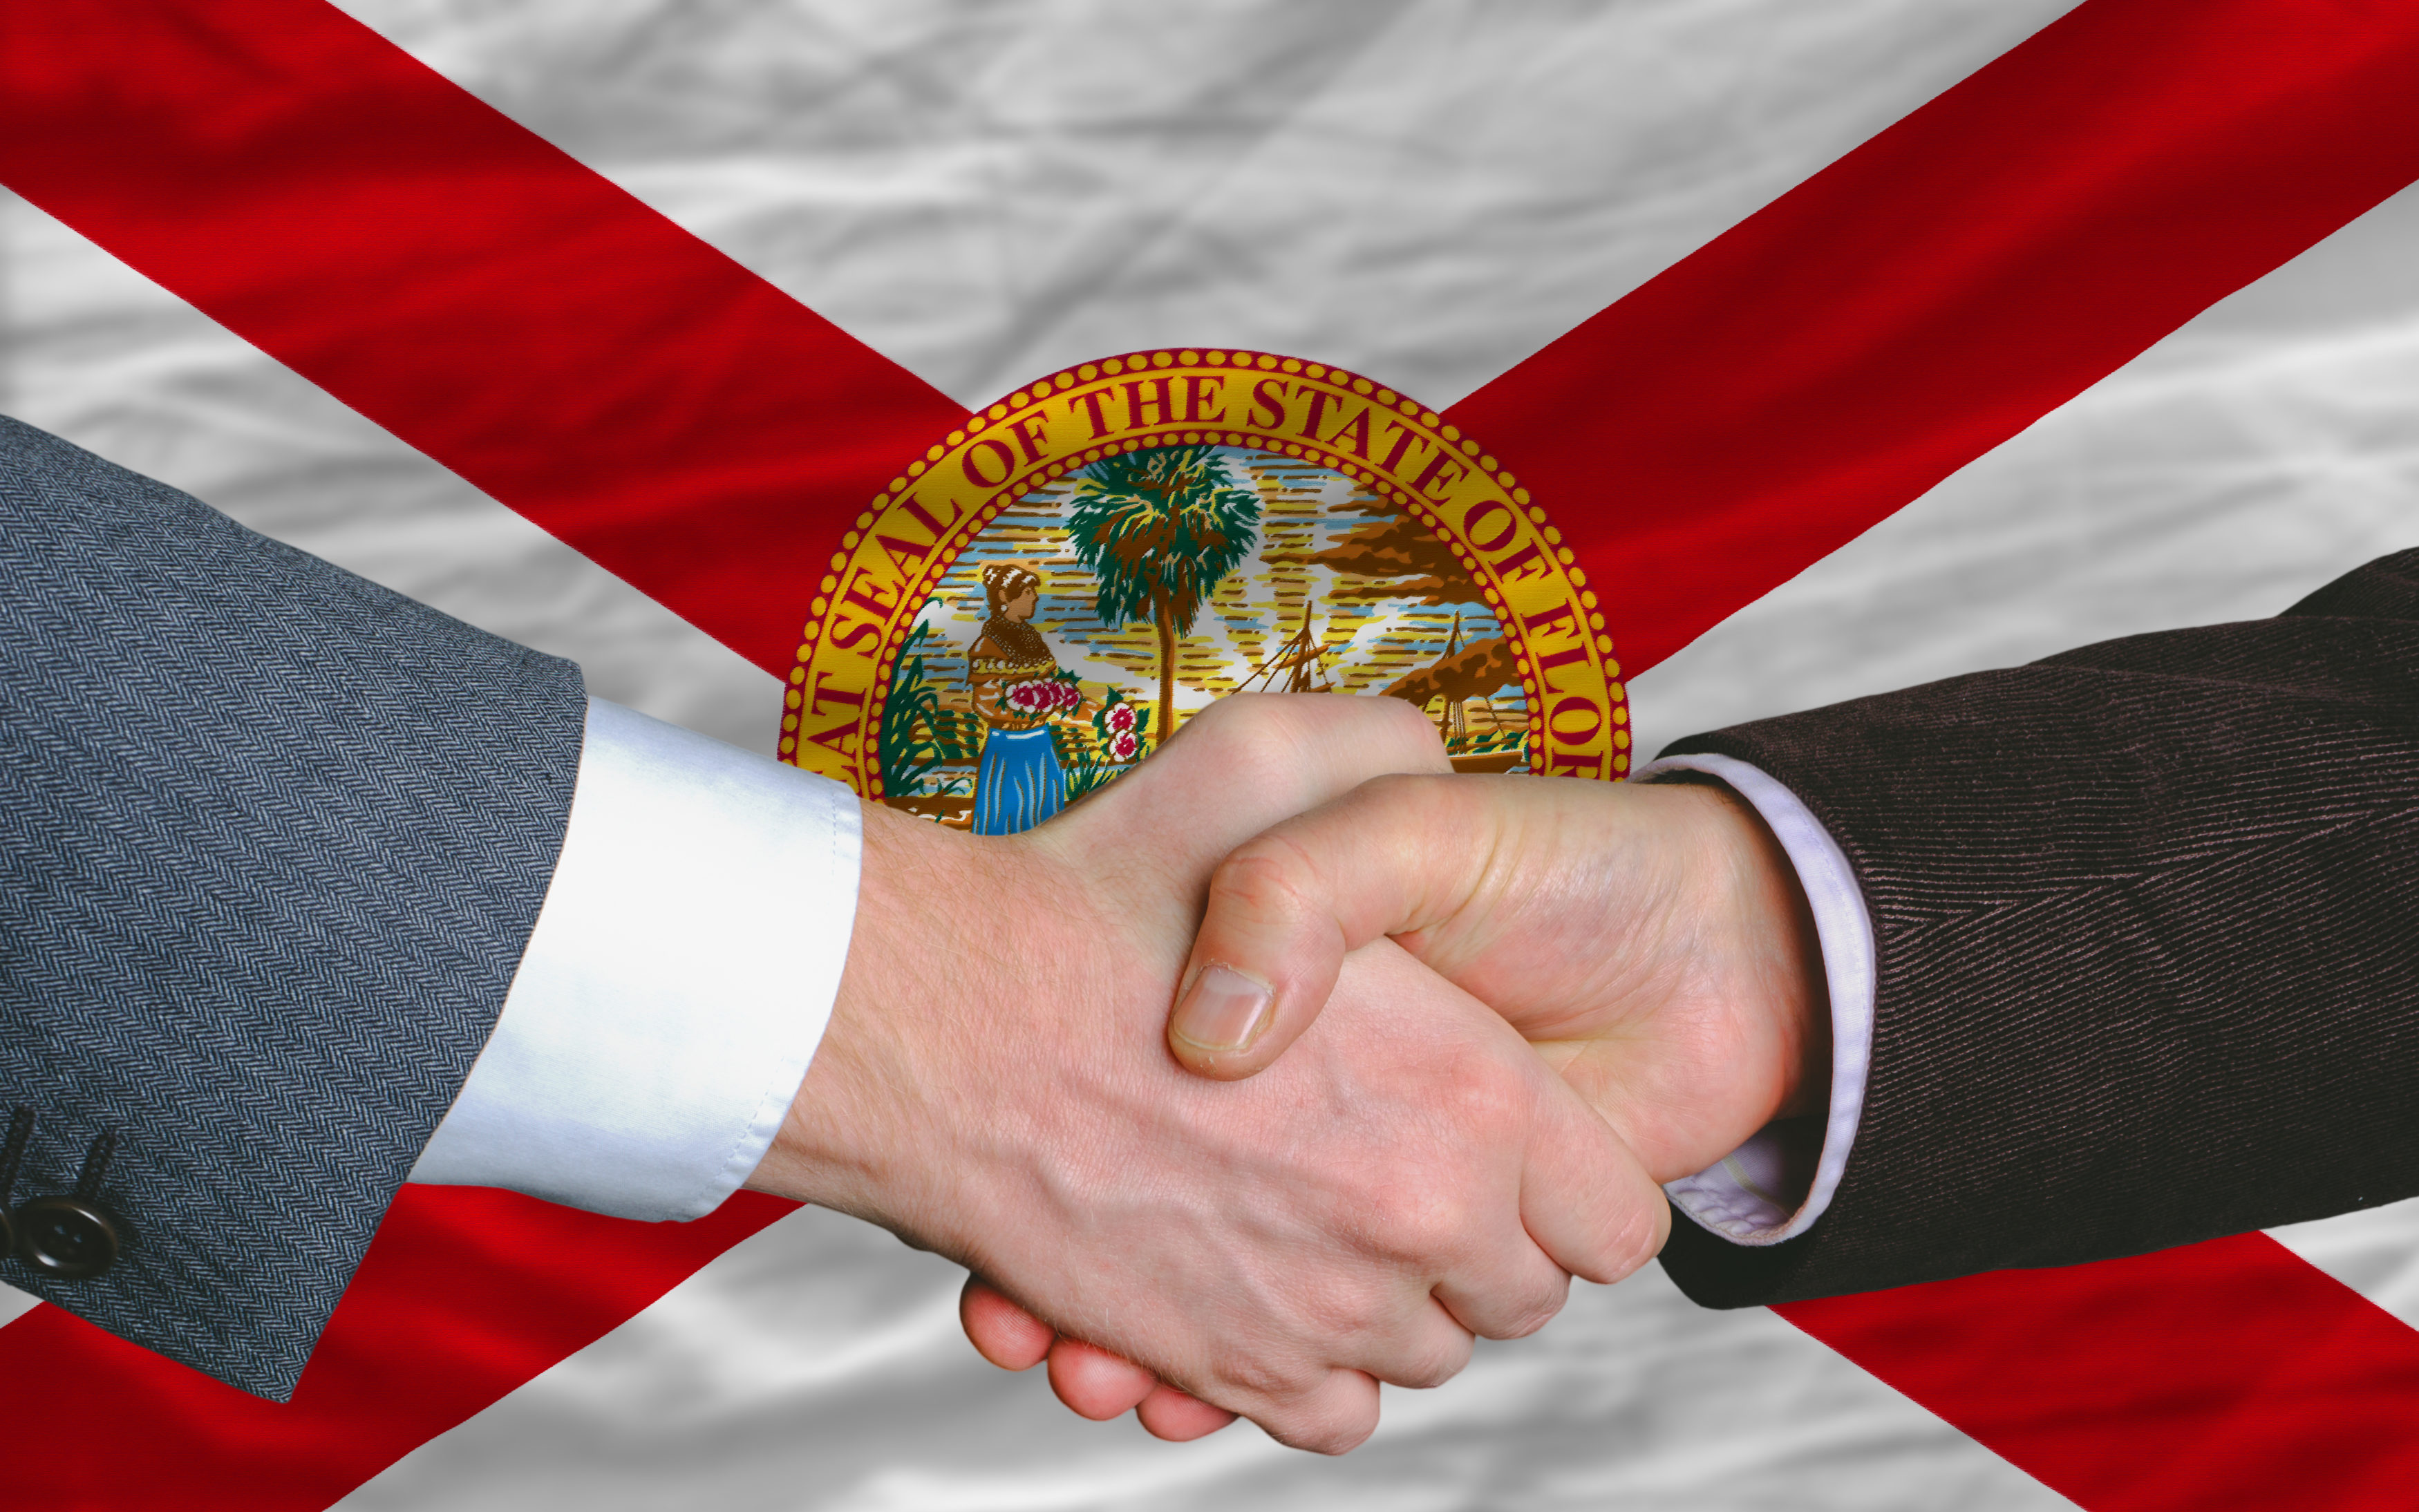 florida-politics-agreement-hands-shaking-3500x2188.jpeg